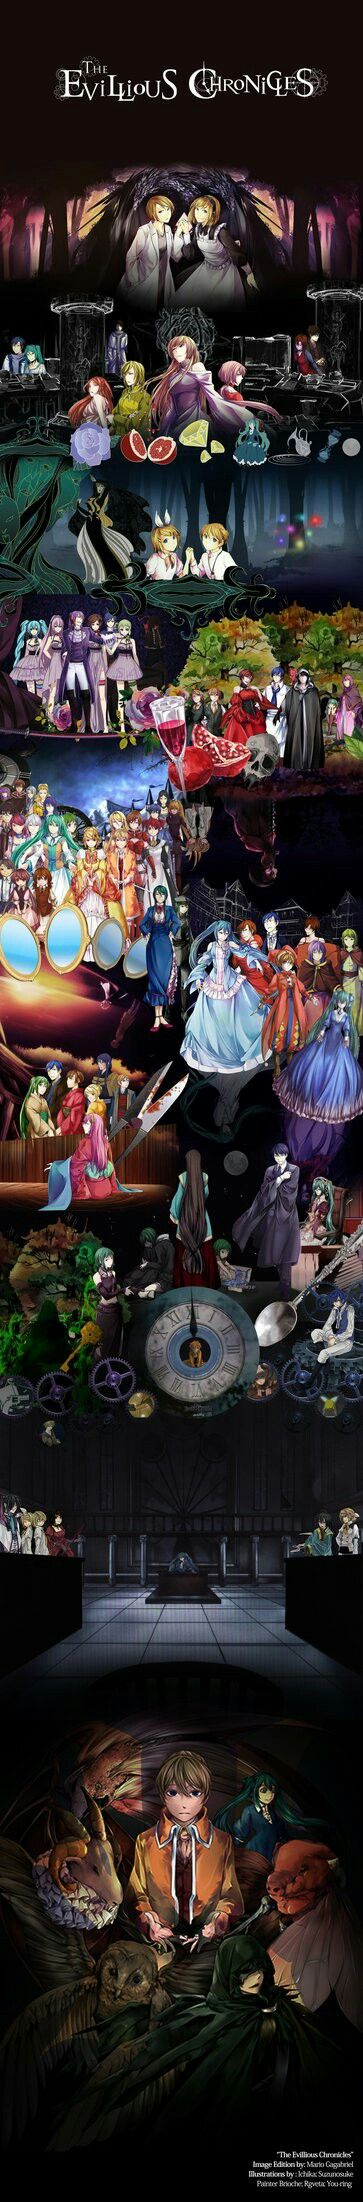 The Evillious Chronicles By: MarioGagabriel